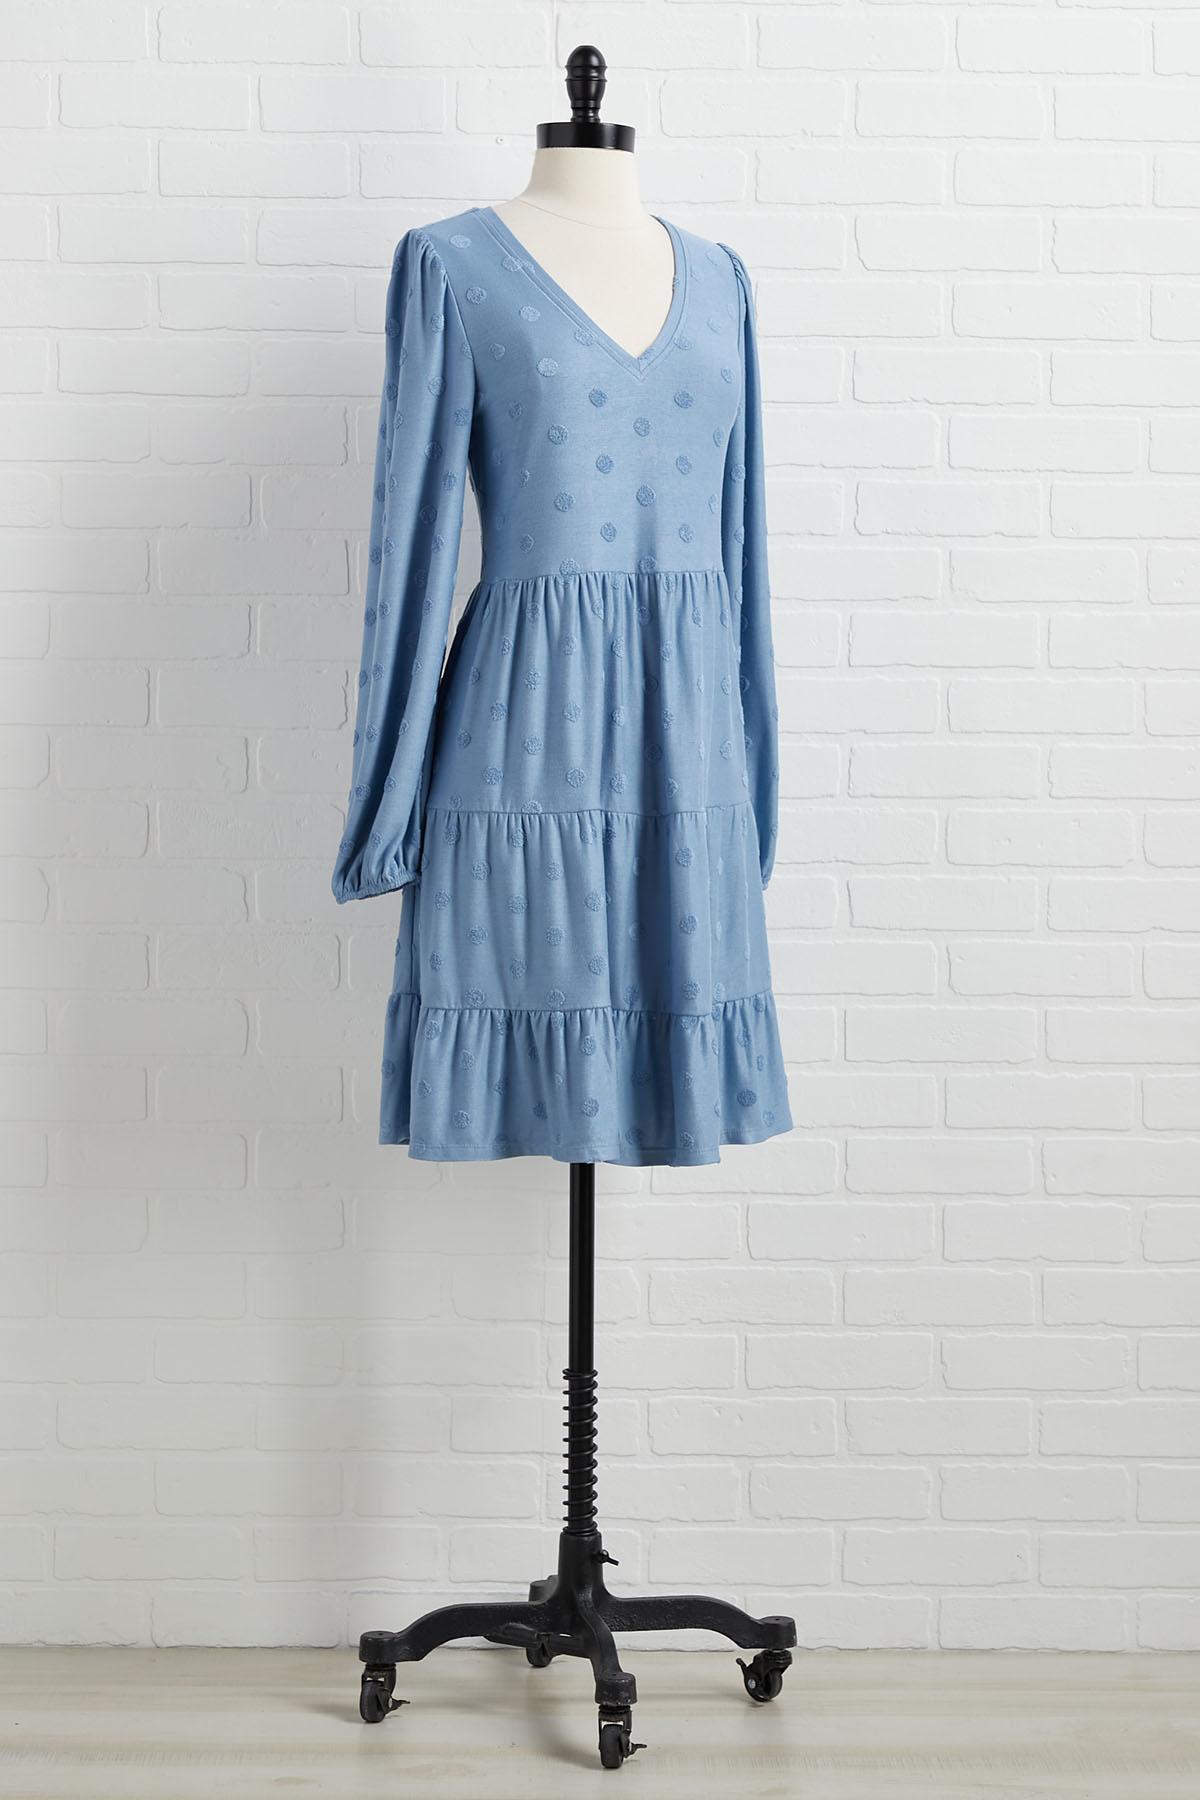 Give Me Just A Mini Dress